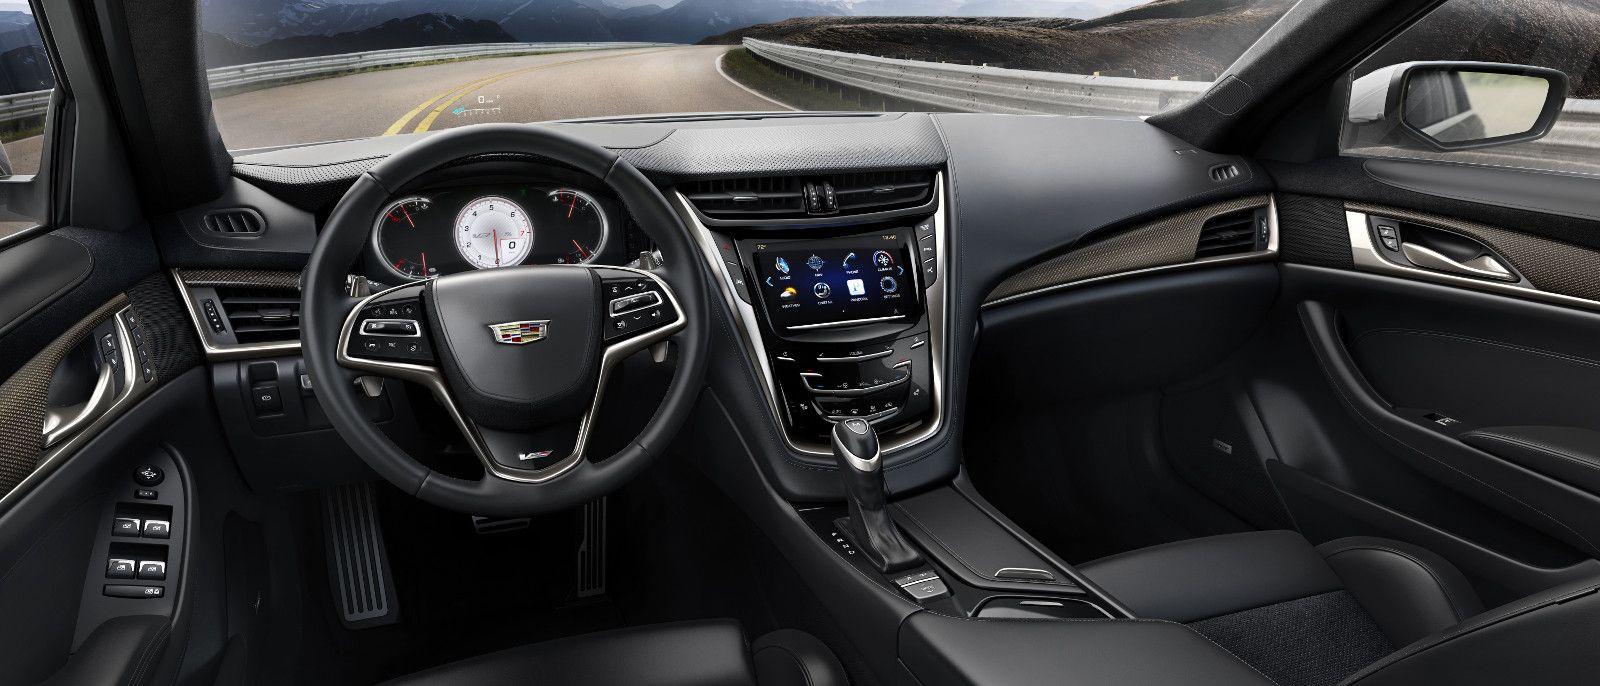 2016 Cadillac Cts V Sedan Interior